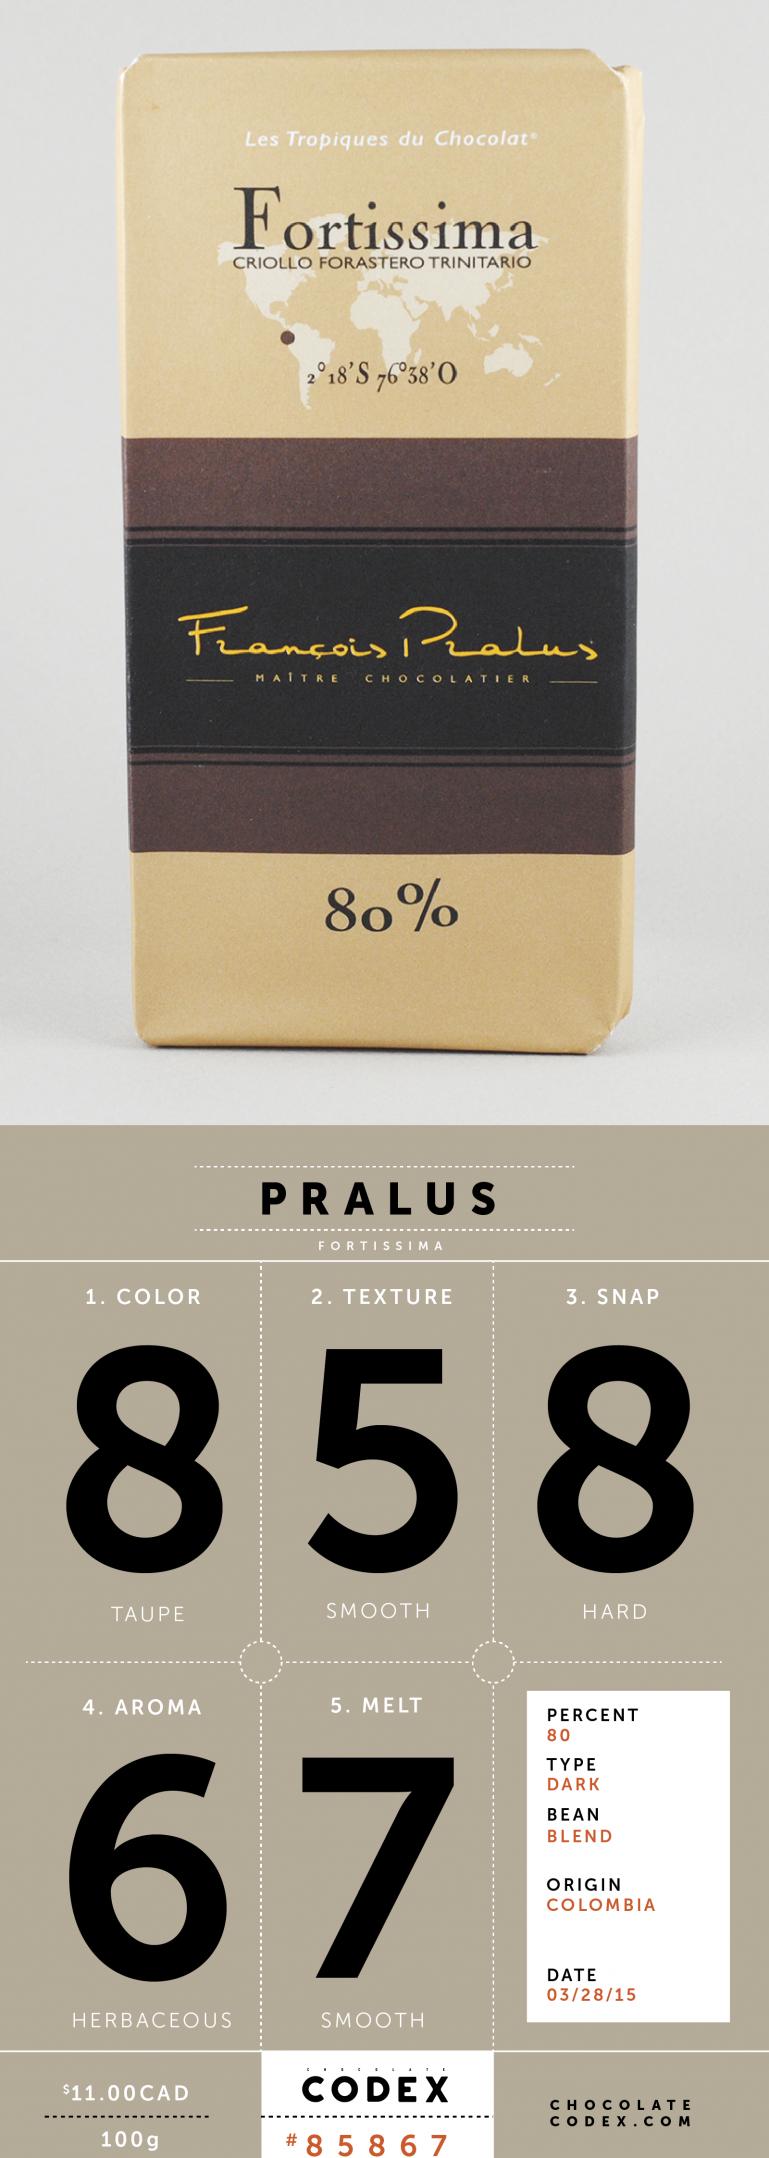 Chocolate-Codex-Reviews-Pralus-Fortissima-80